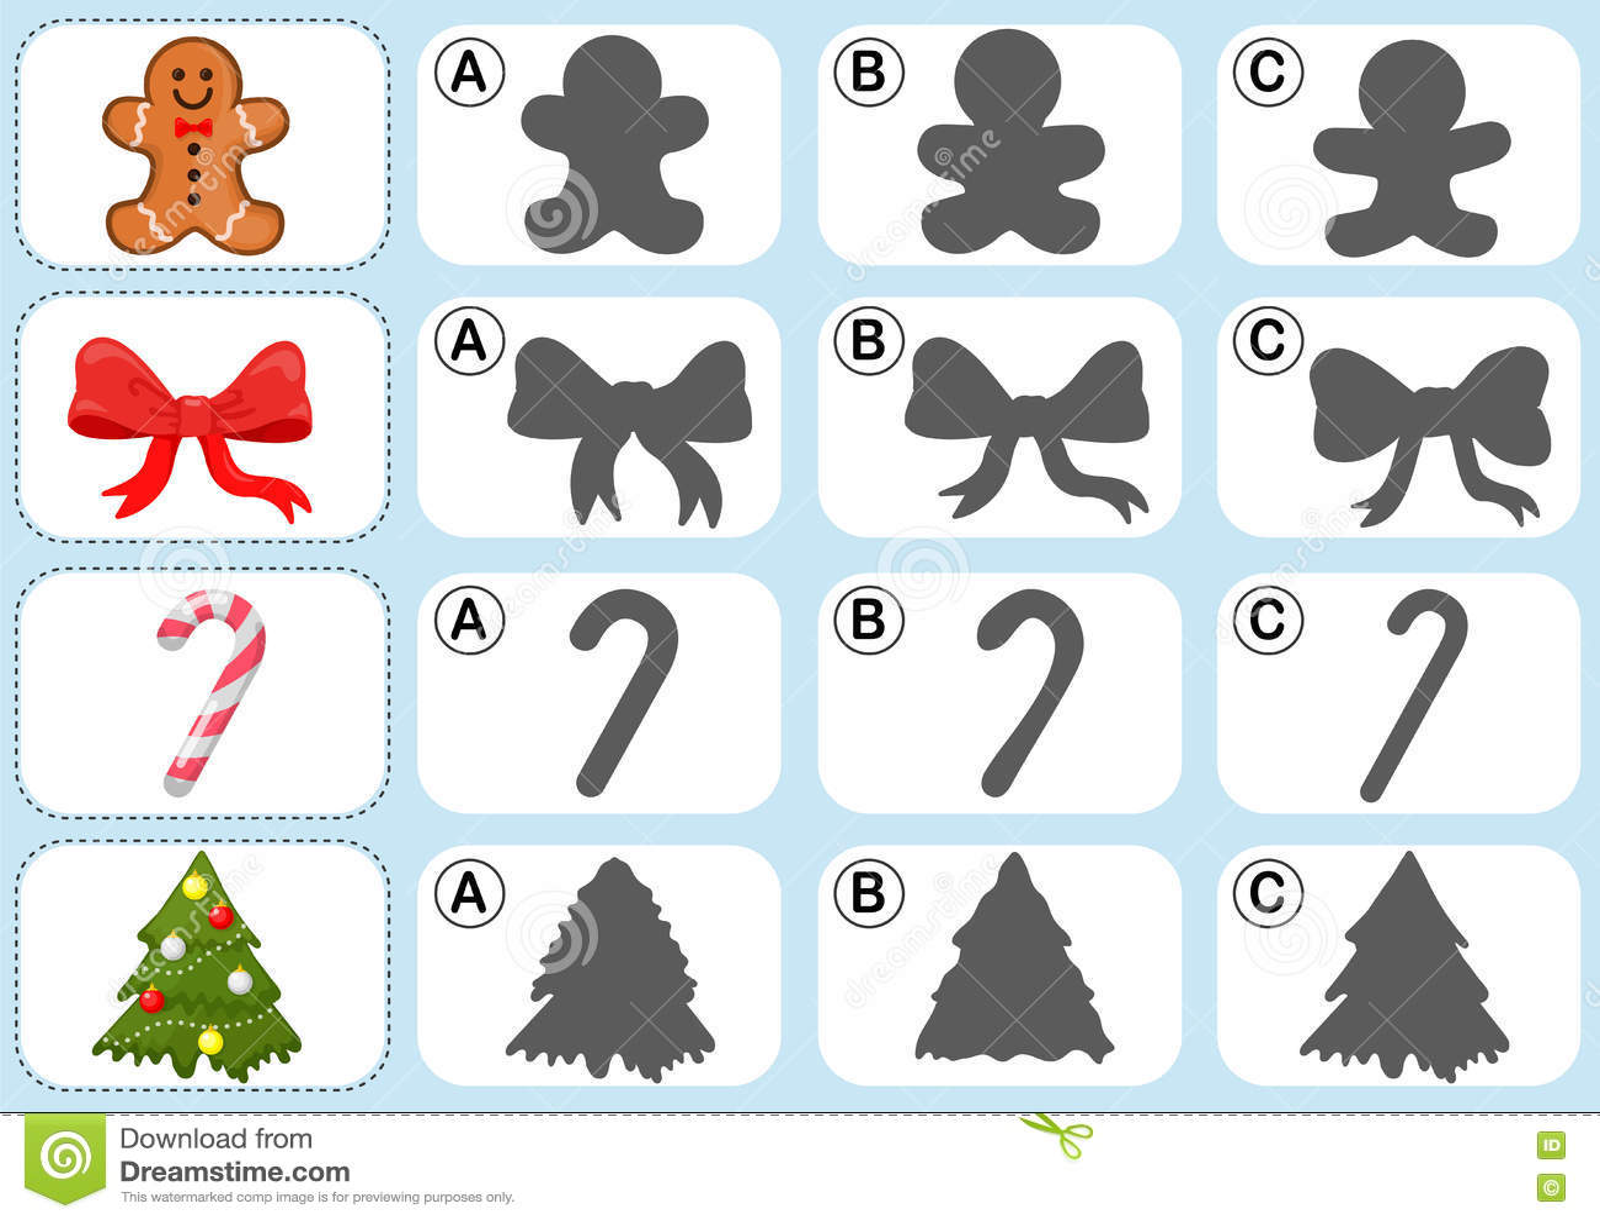 Christmas Theme Activity Sheet